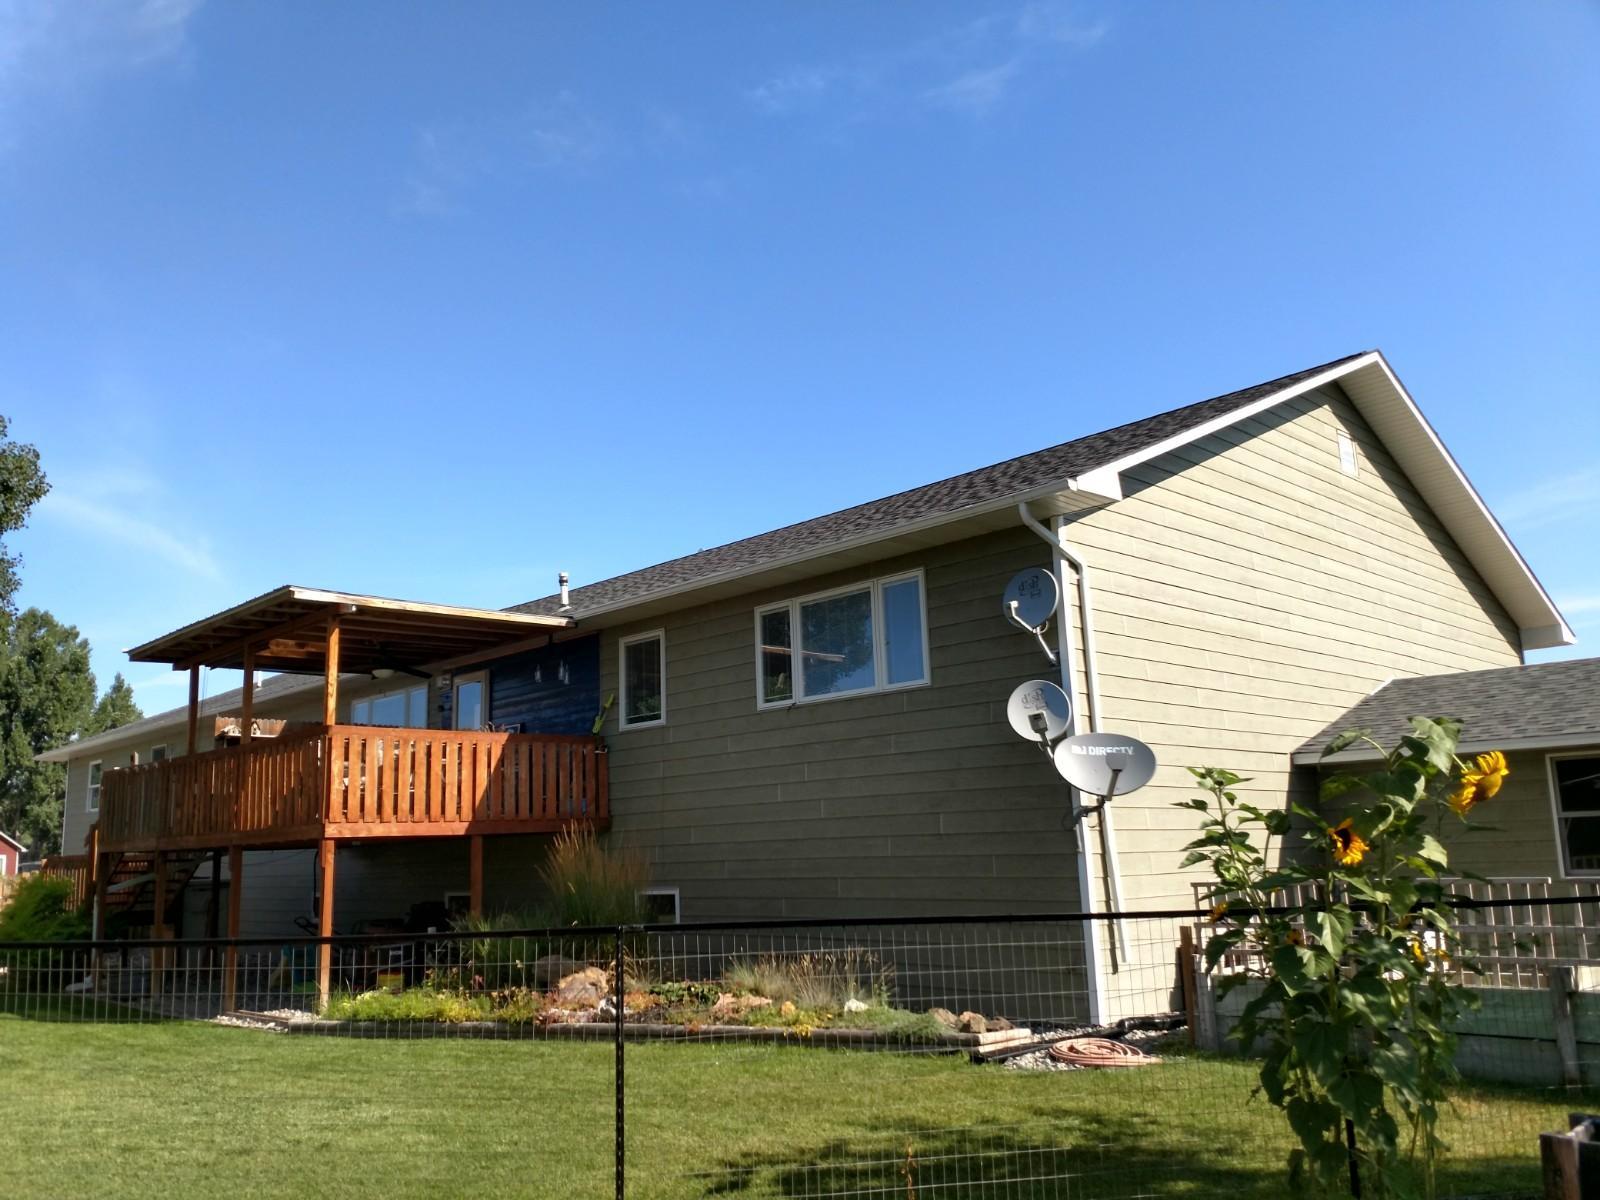 103 Carl Street, Ranchester, Wyoming 82839, 3 Bedrooms Bedrooms, ,2 BathroomsBathrooms,Residential,For Sale,Carl,19-384